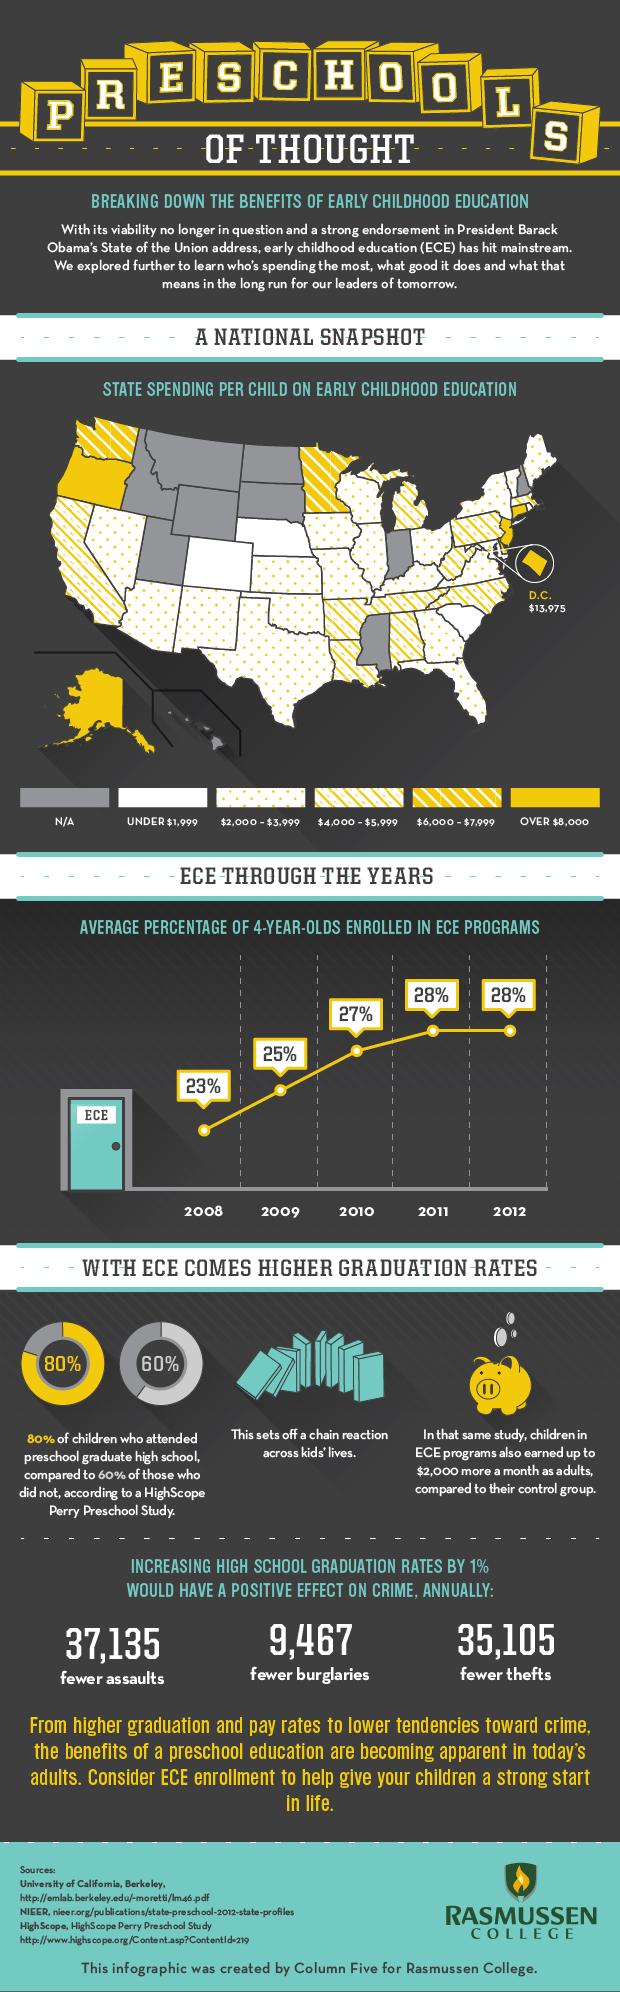 graduate programs comparison